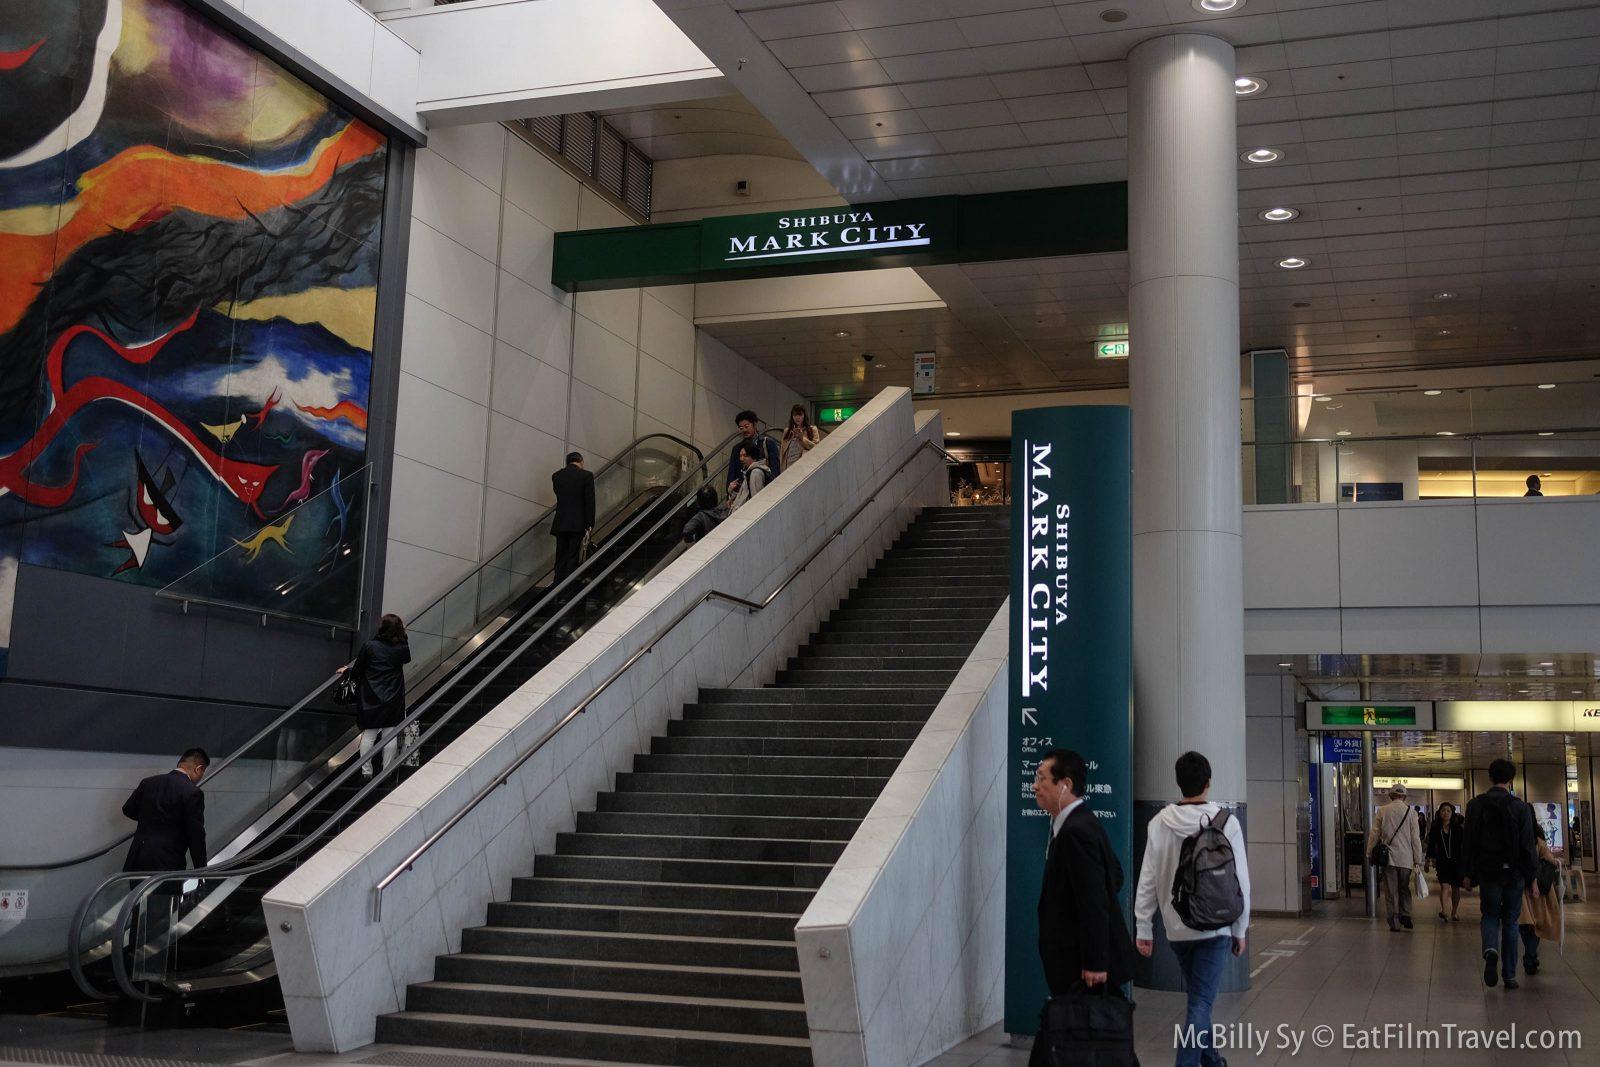 Mark City Hotel in Shibuya Tokyo Japan